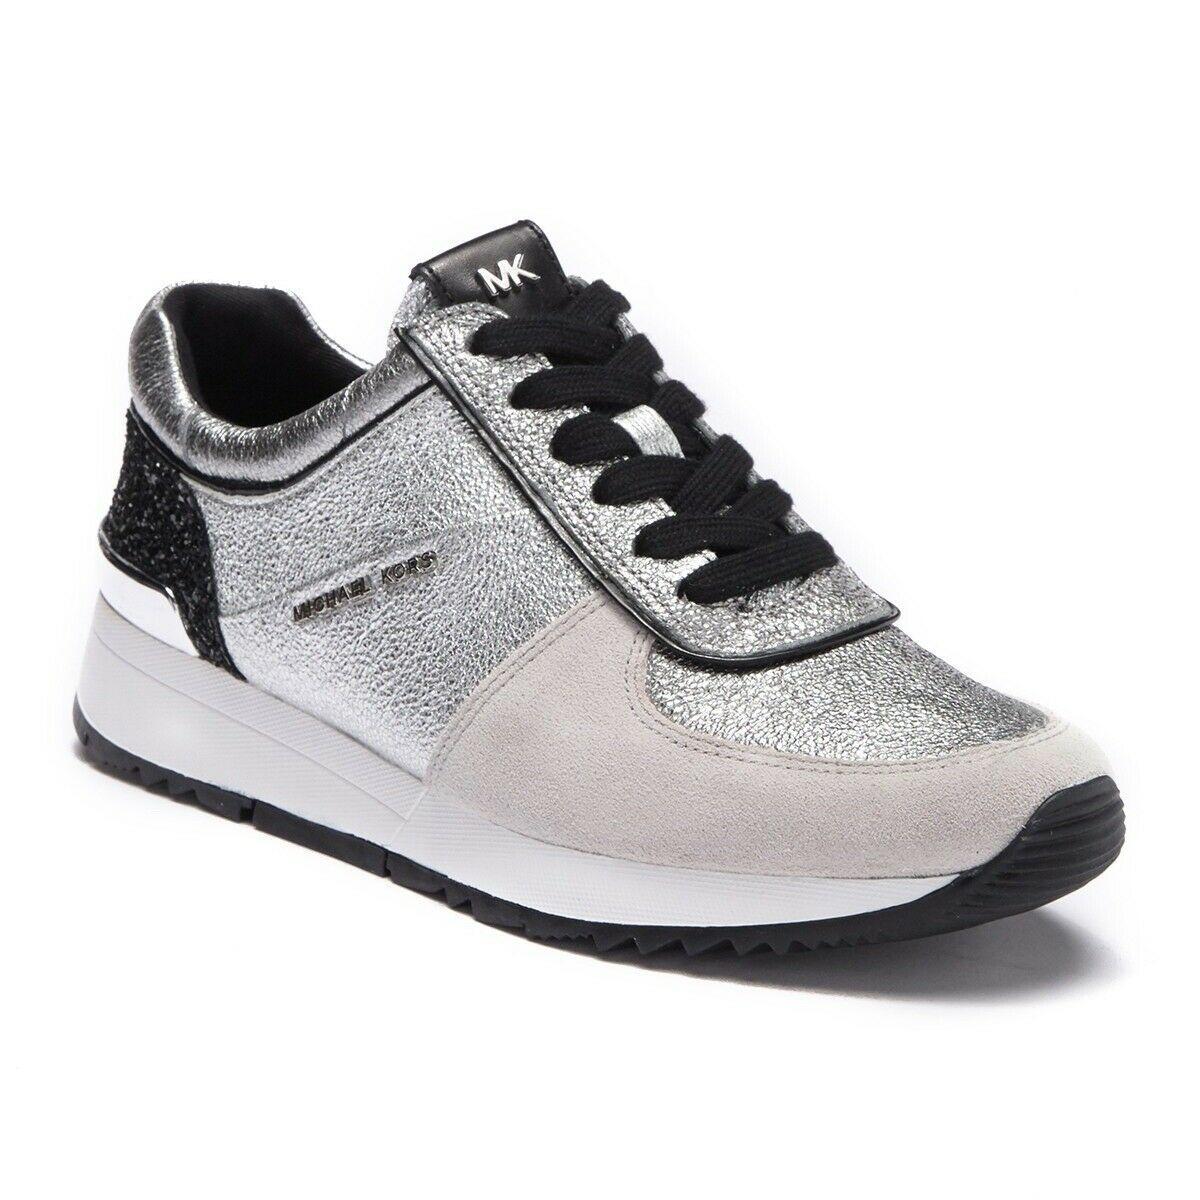 Michael Kors MK Women's Allie Trainer Sparkle Metallic Sneakers Shoes Silver